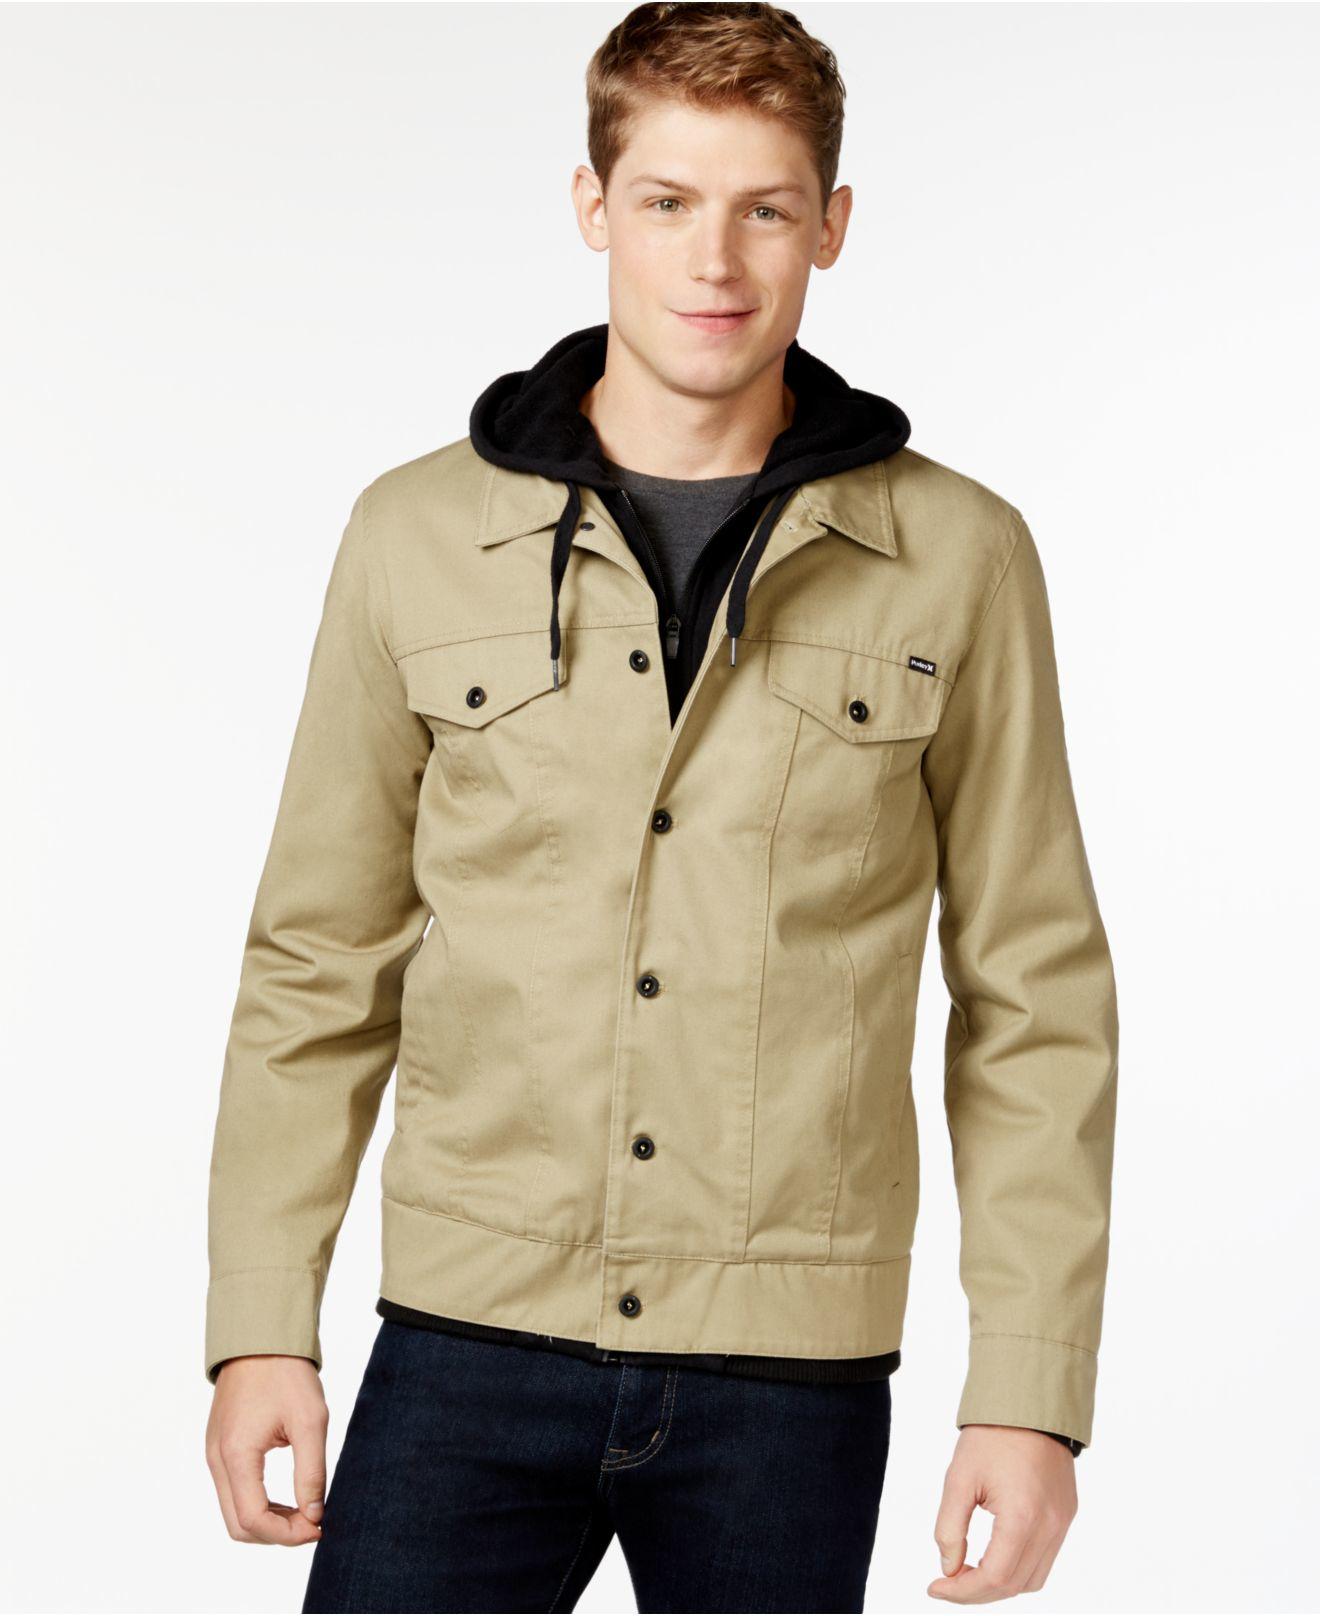 trucker jackets for men